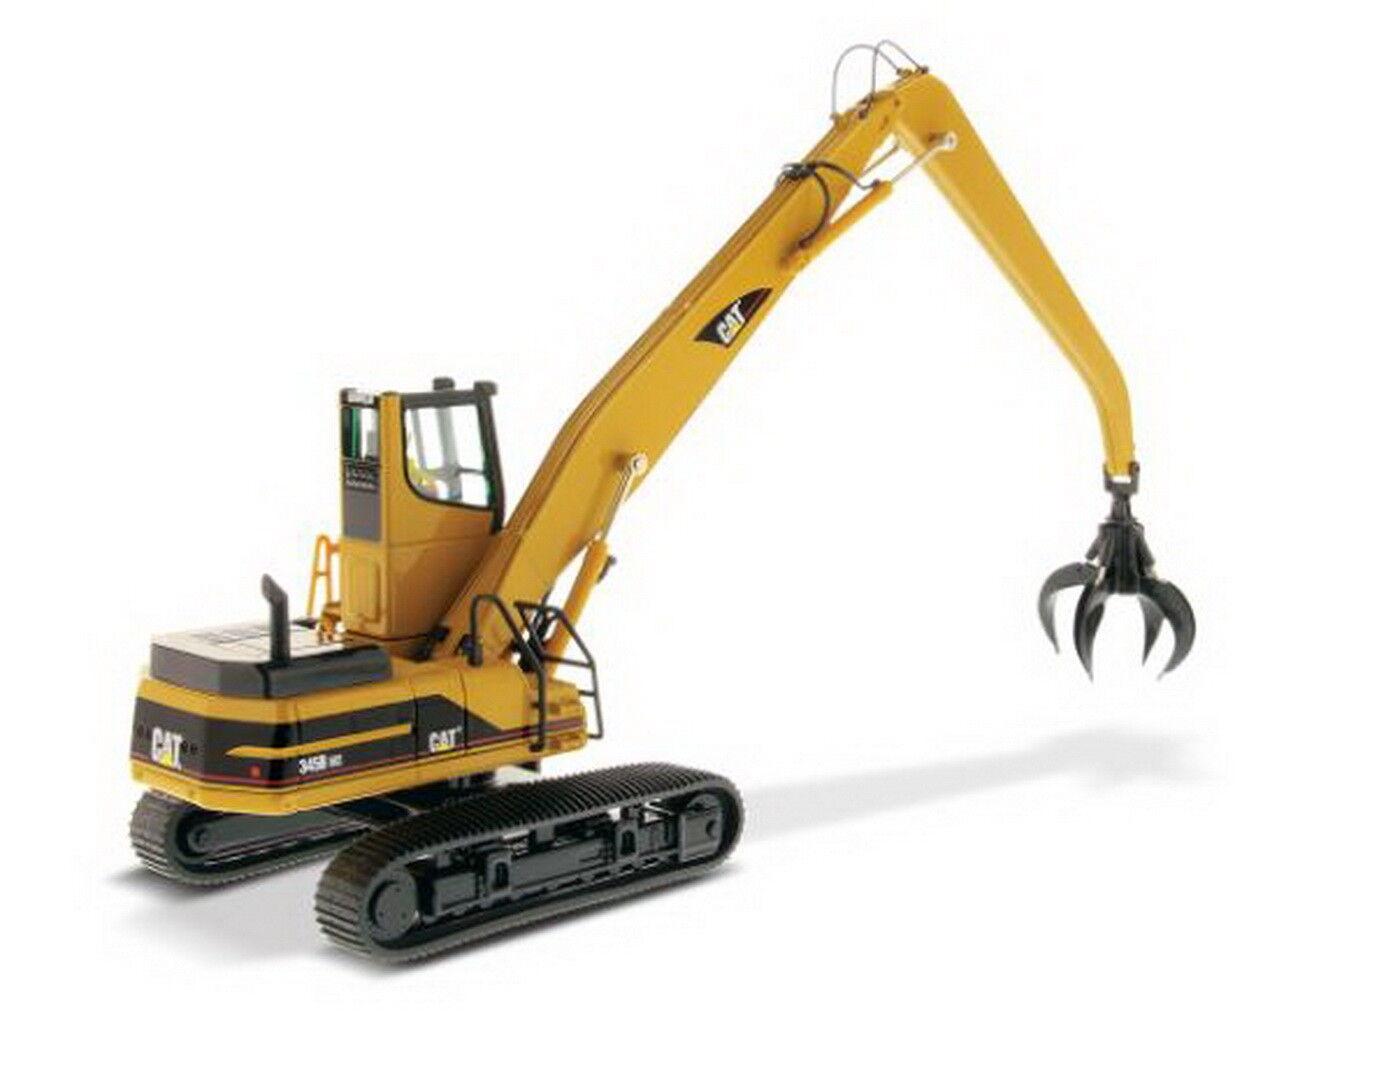 1 50 dm Caterpillar Cat 345B Serie Ii Modelo Diecast administrador de material